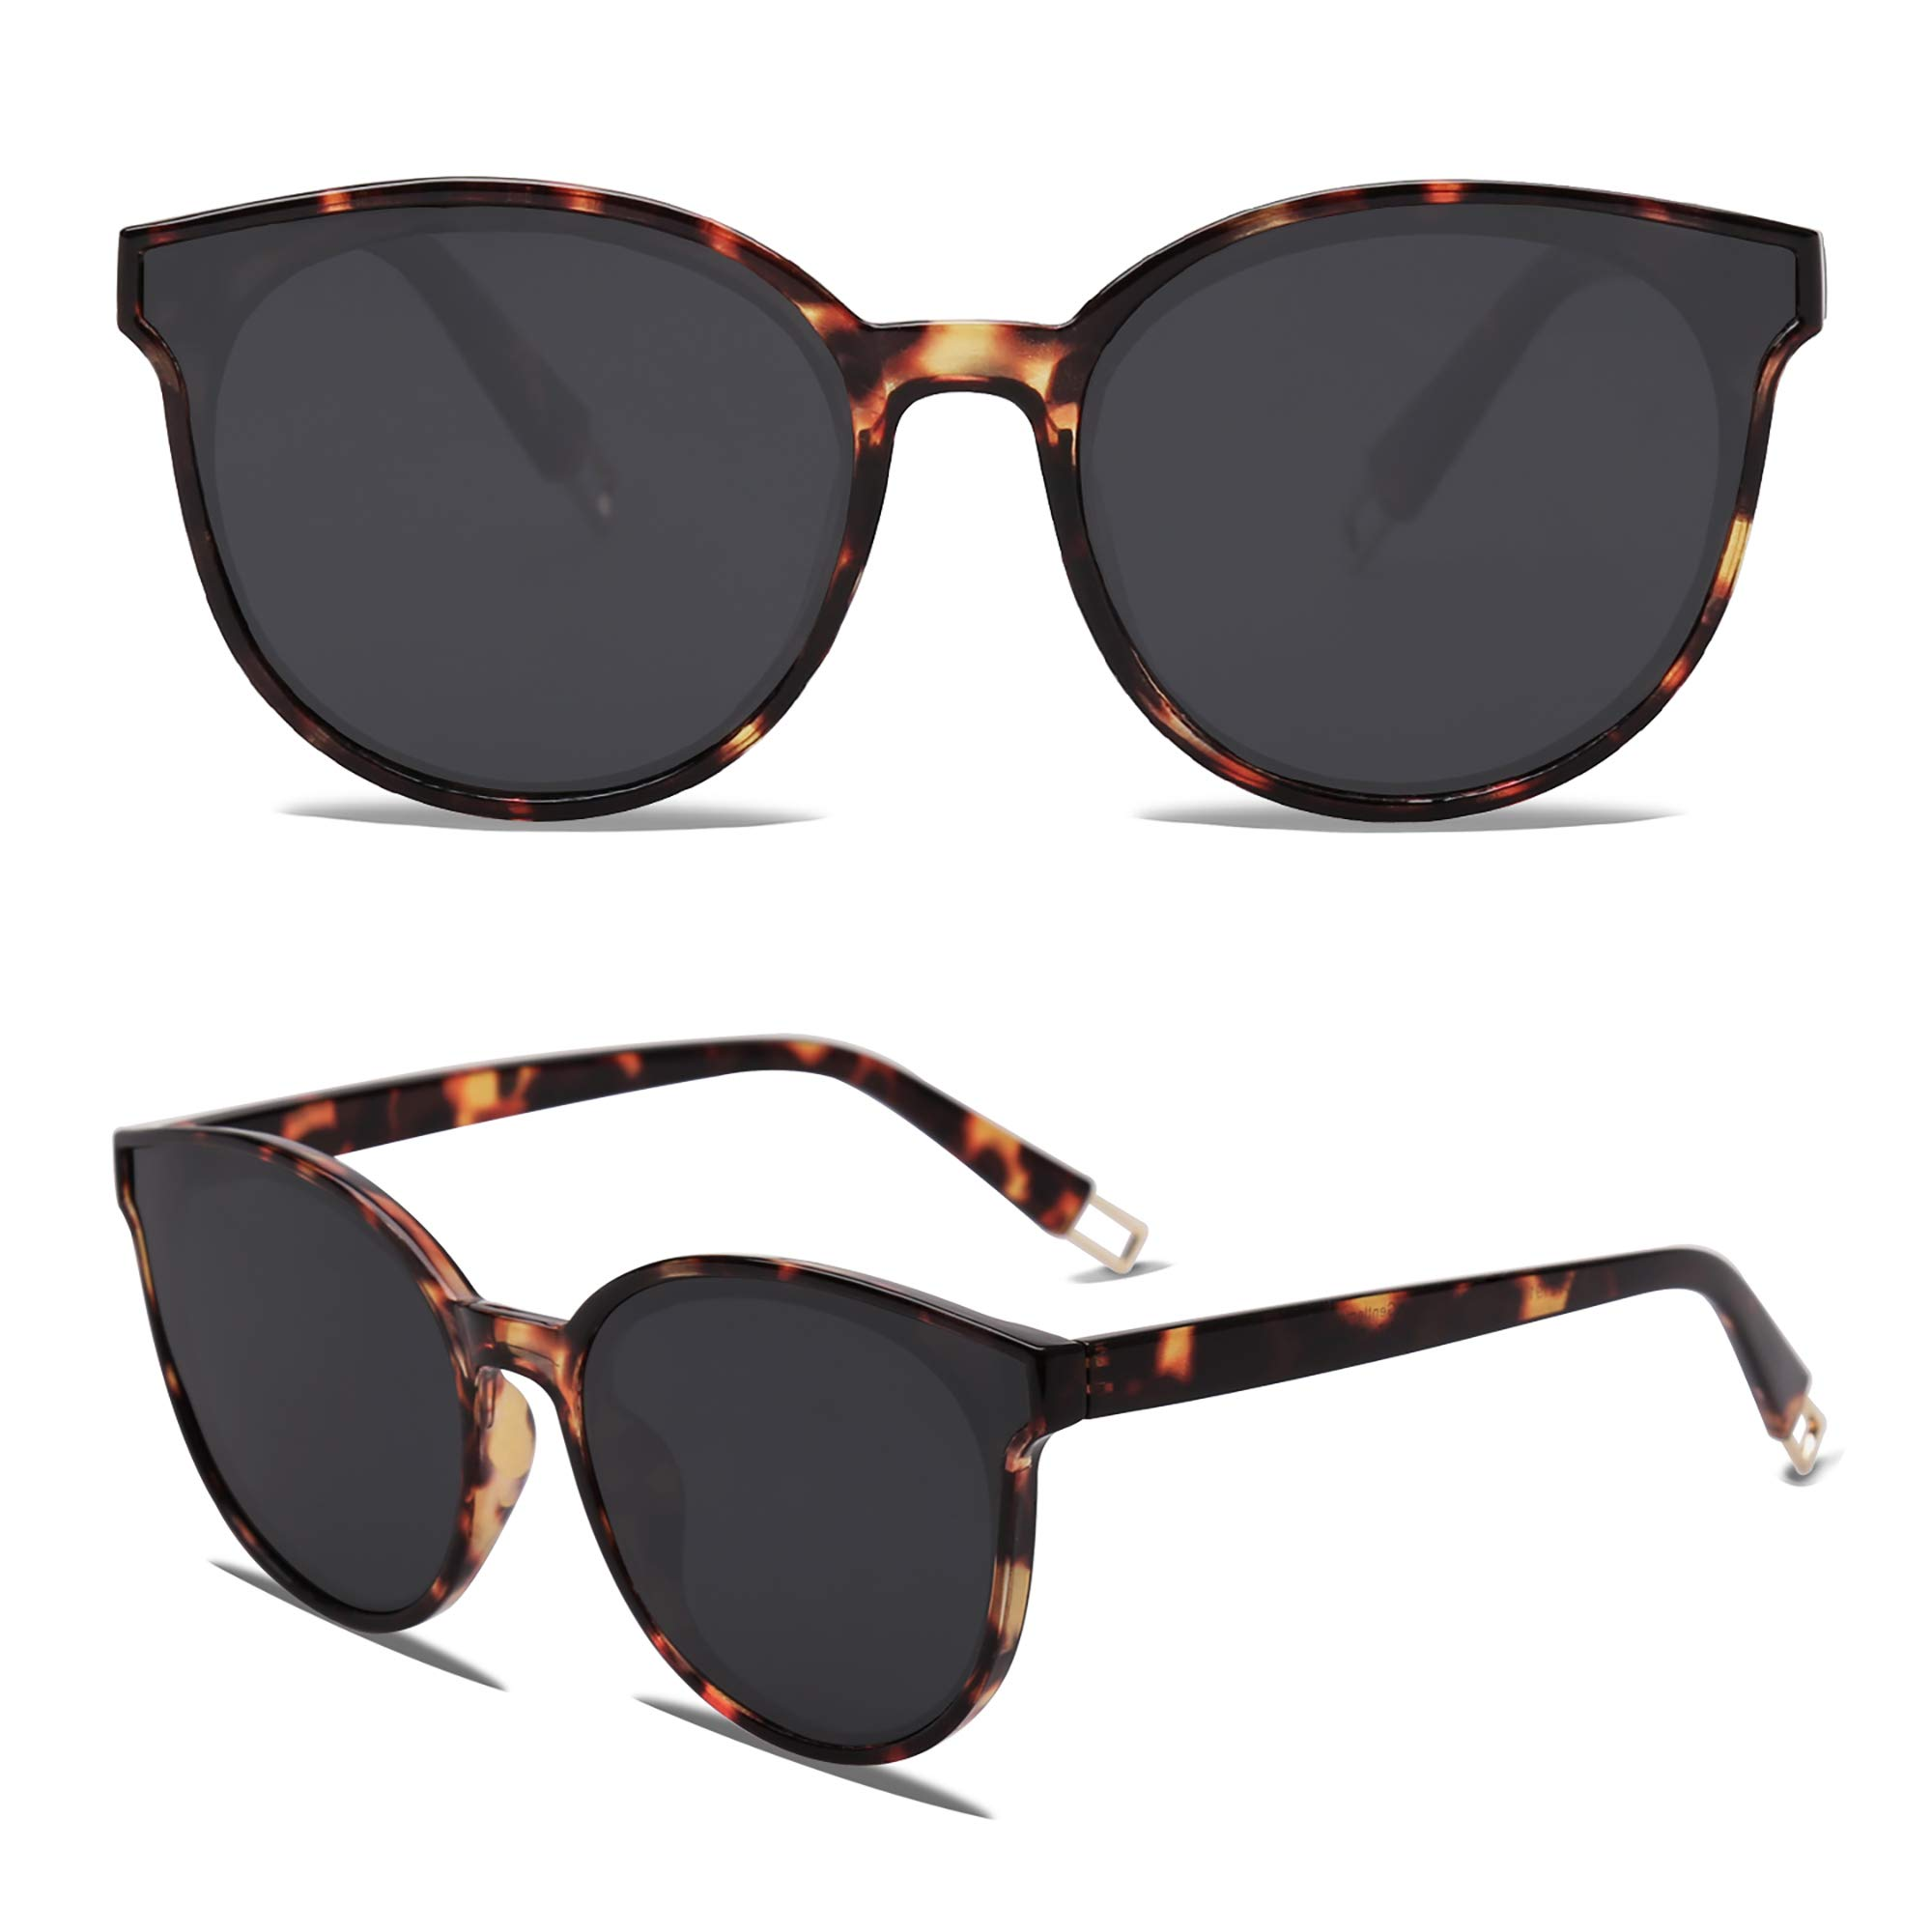 Fashion Round Sunglasses for Women Men Oversized Vintage Shades SJ2057